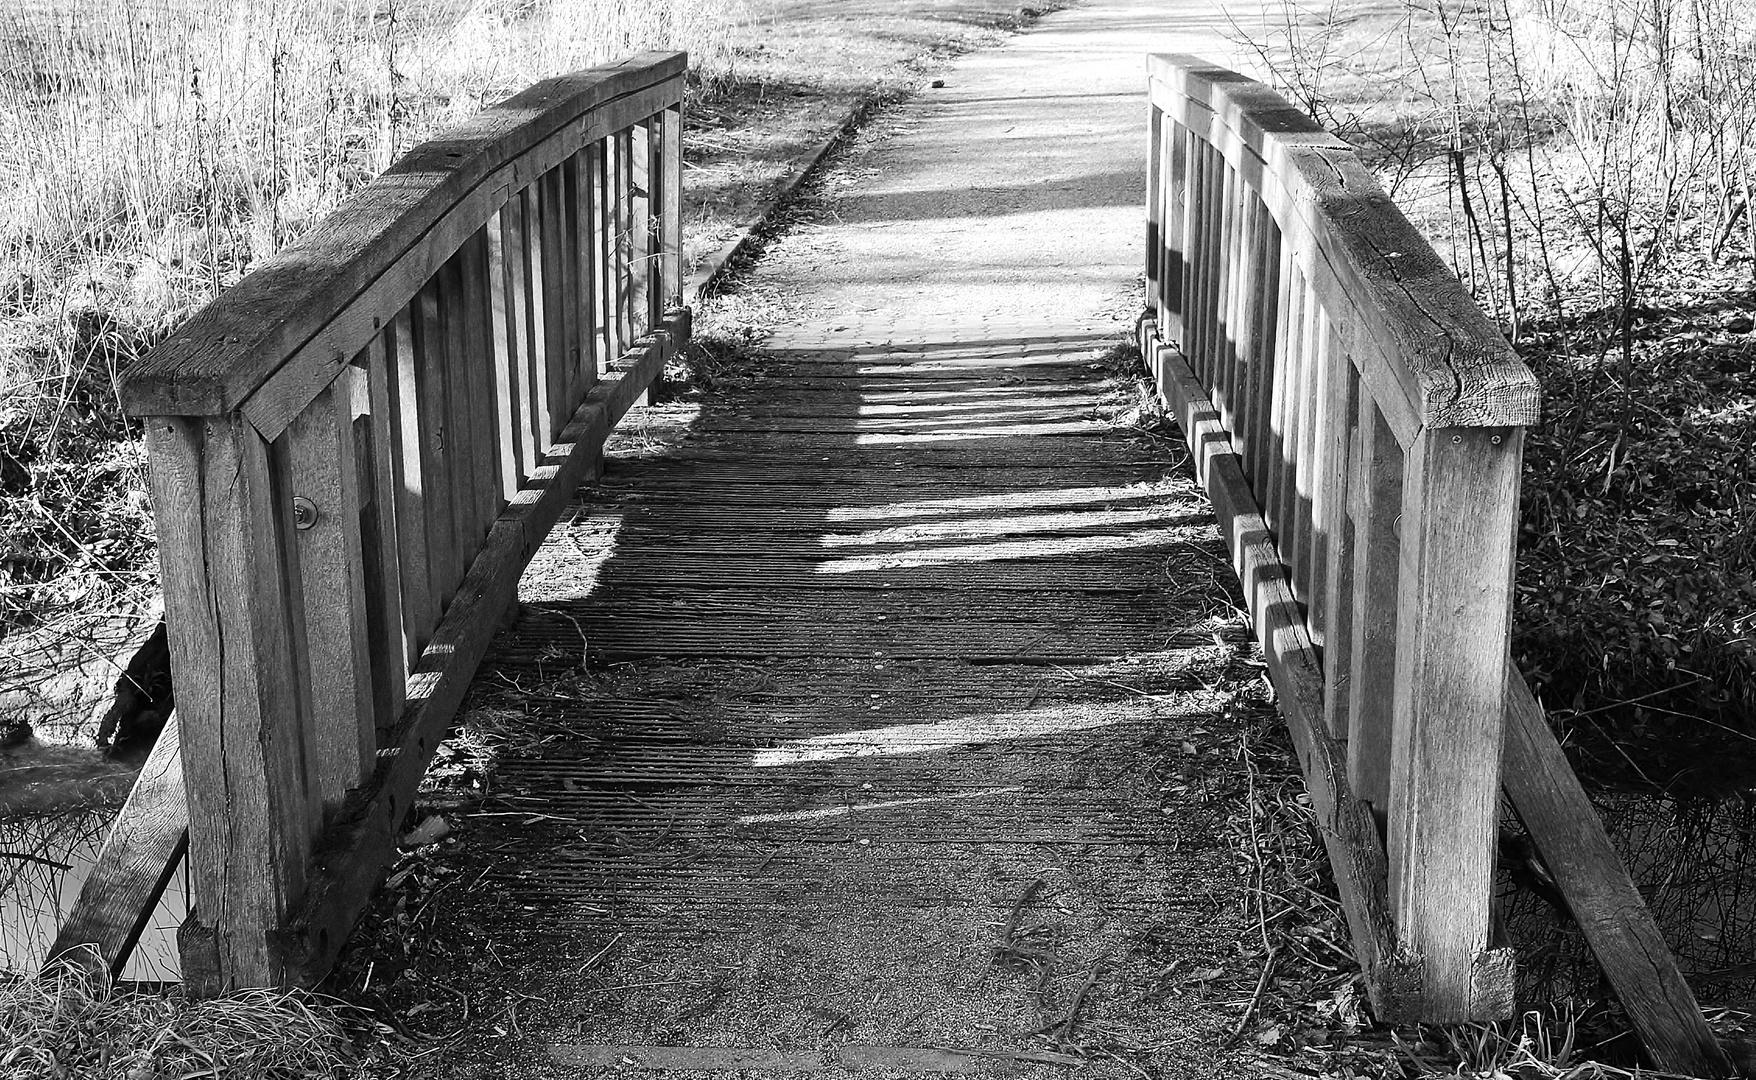 die kleine Holzbrücke